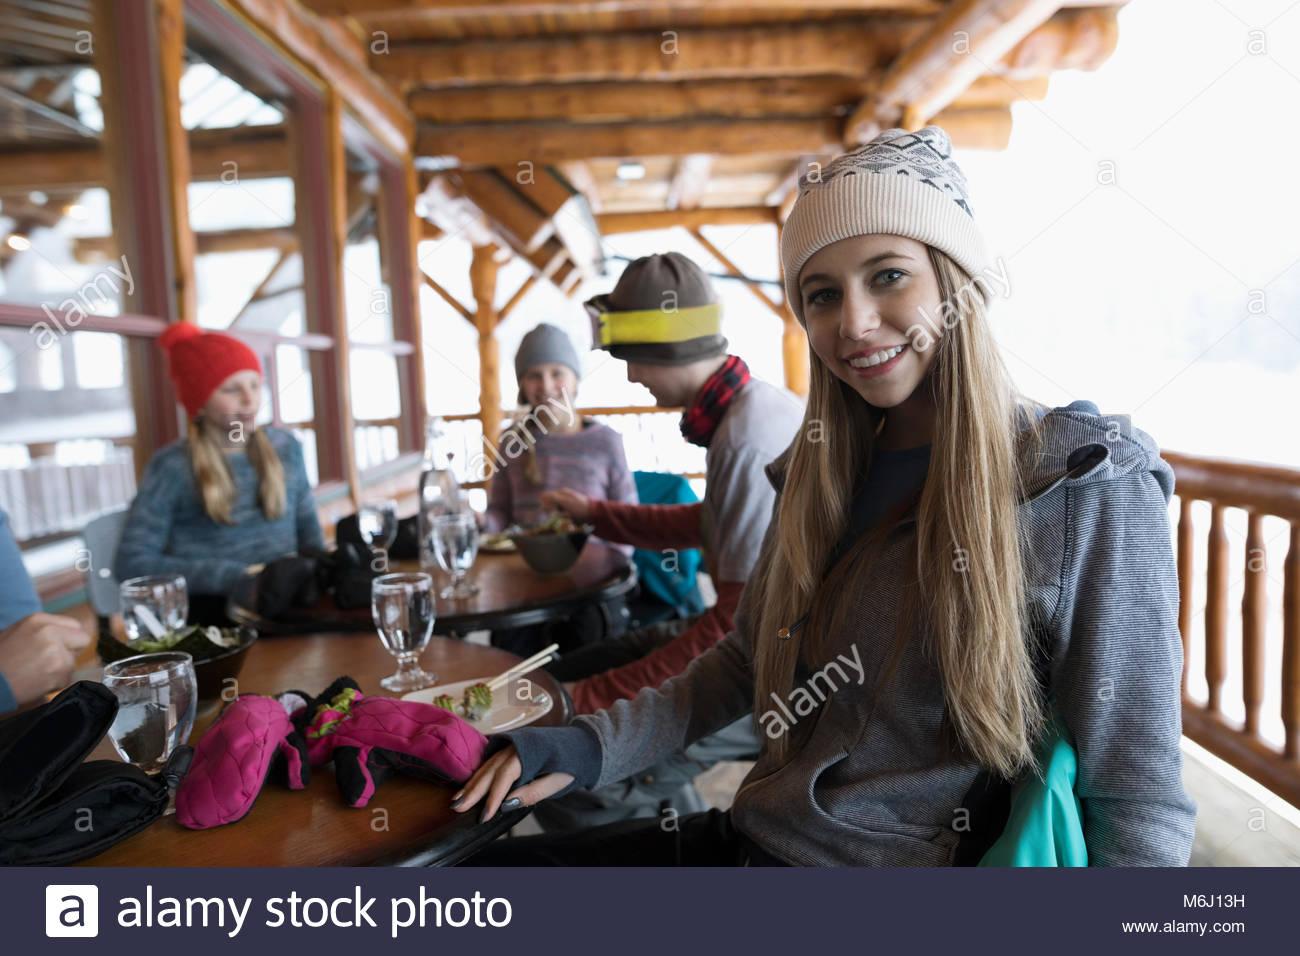 Portrait smiling, confident teenage girl skier eating with family apres-ski on ski resort lodge balcony - Stock Image